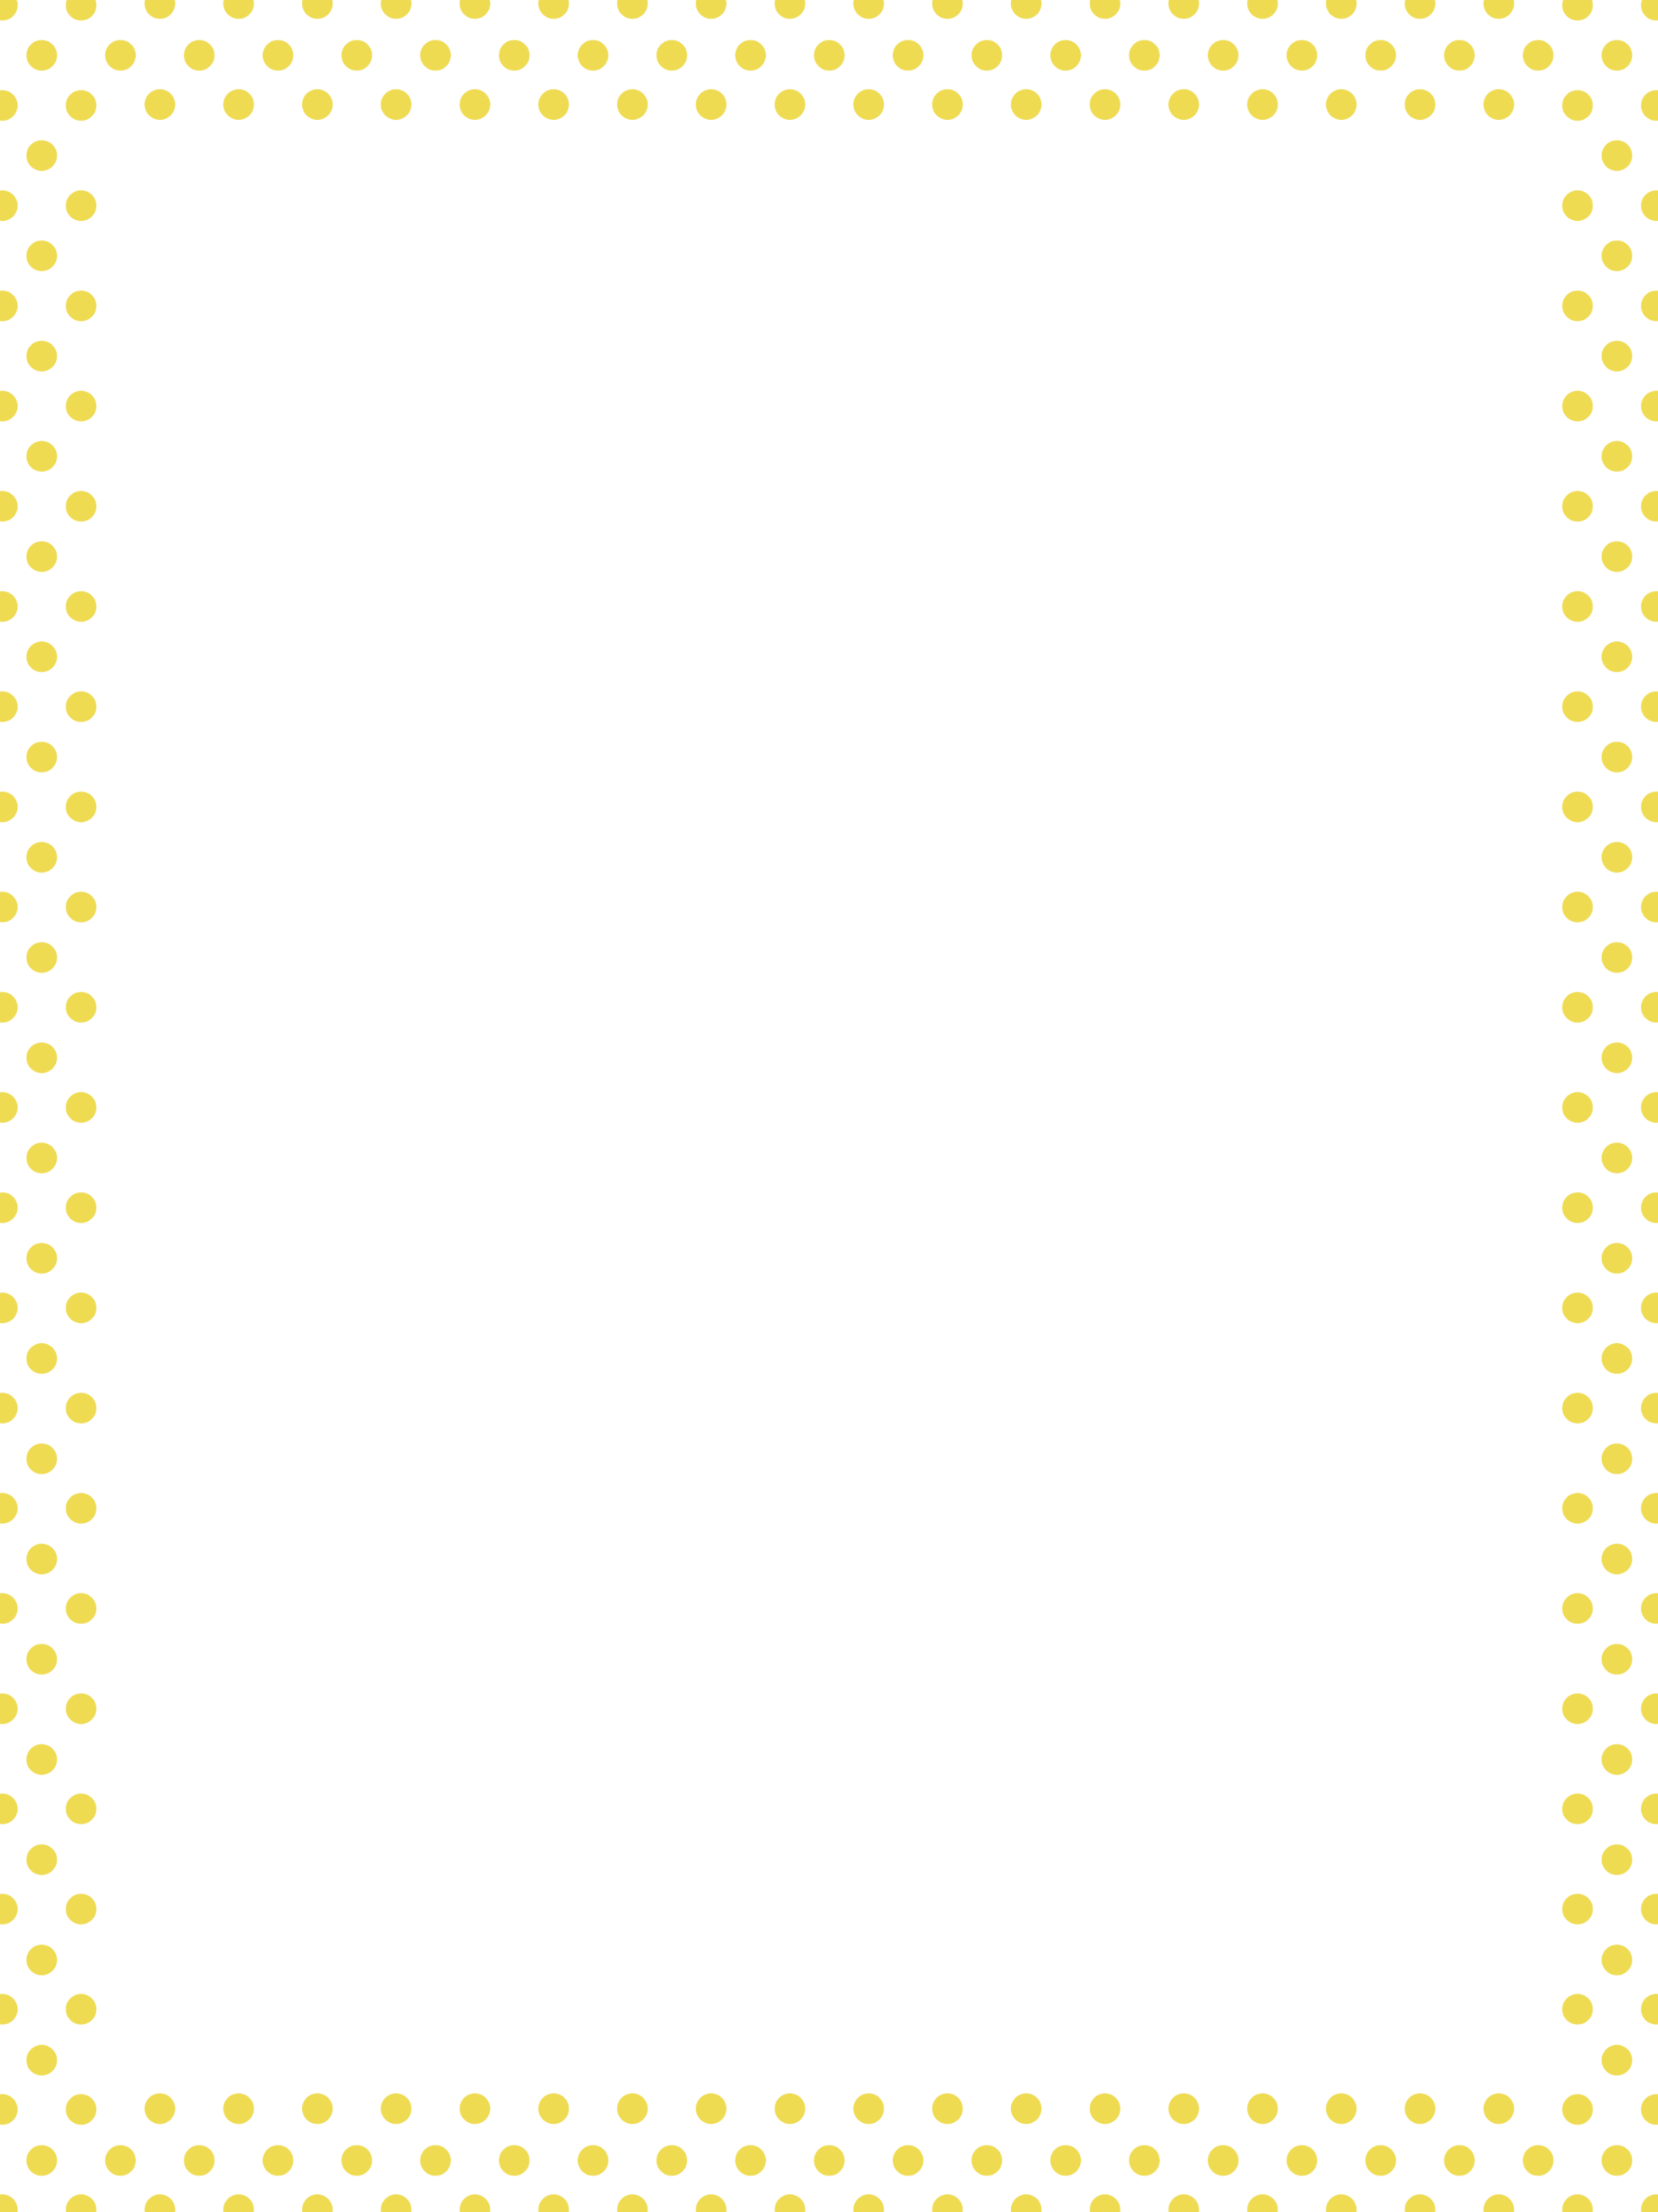 Ipad Vertical_2048x2732_Dots_Yellow.png